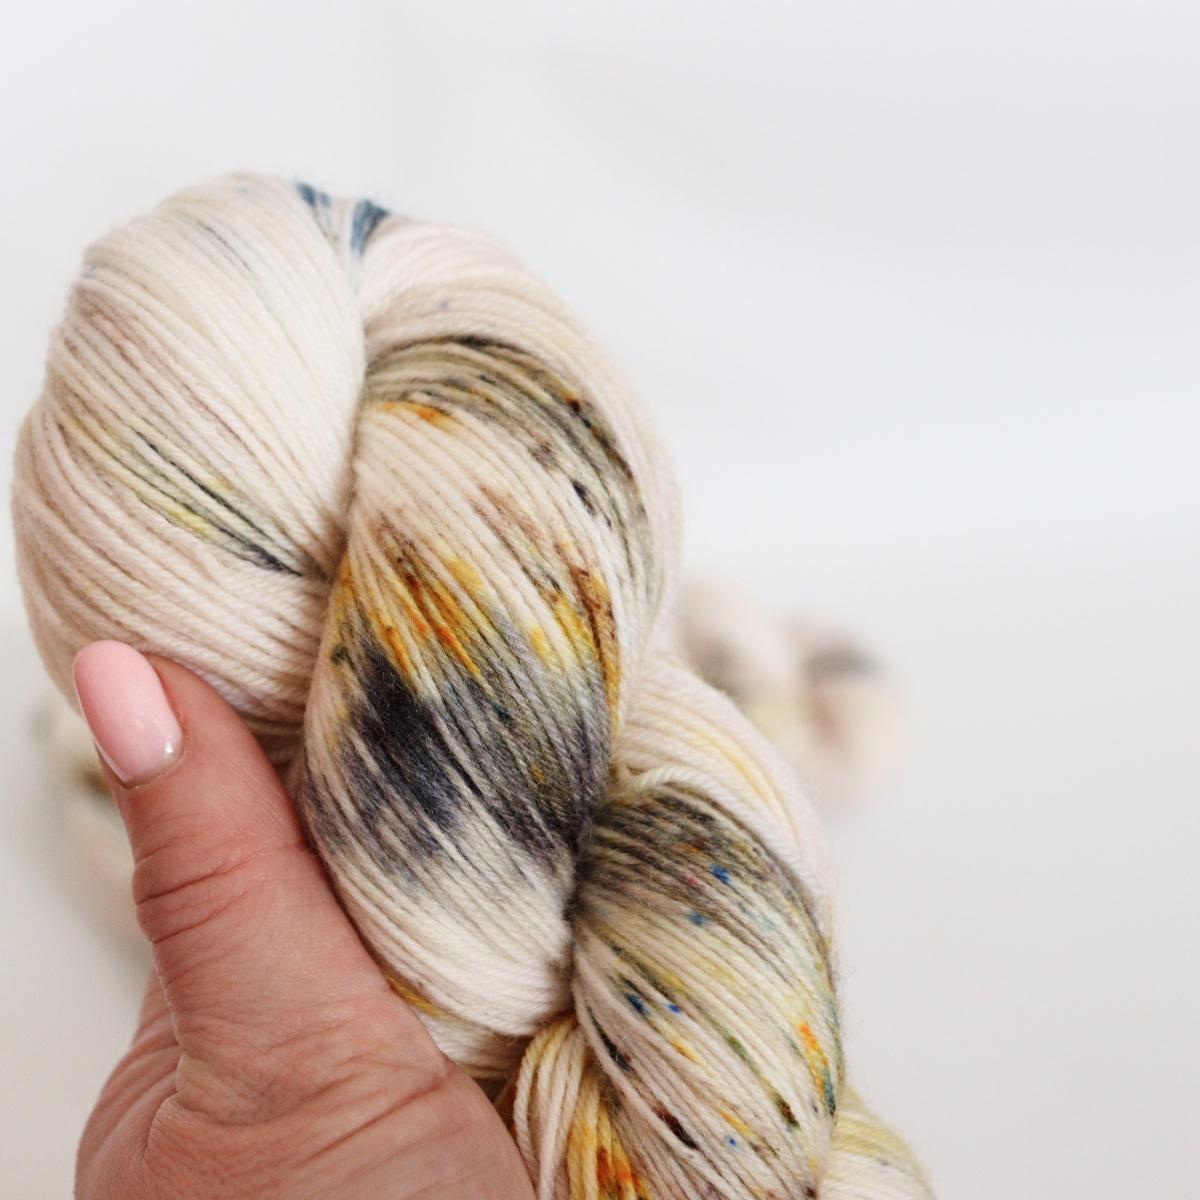 woodico.pro hand dyed yarn 060 2 1200x1200 - Hand dyed yarn / 060